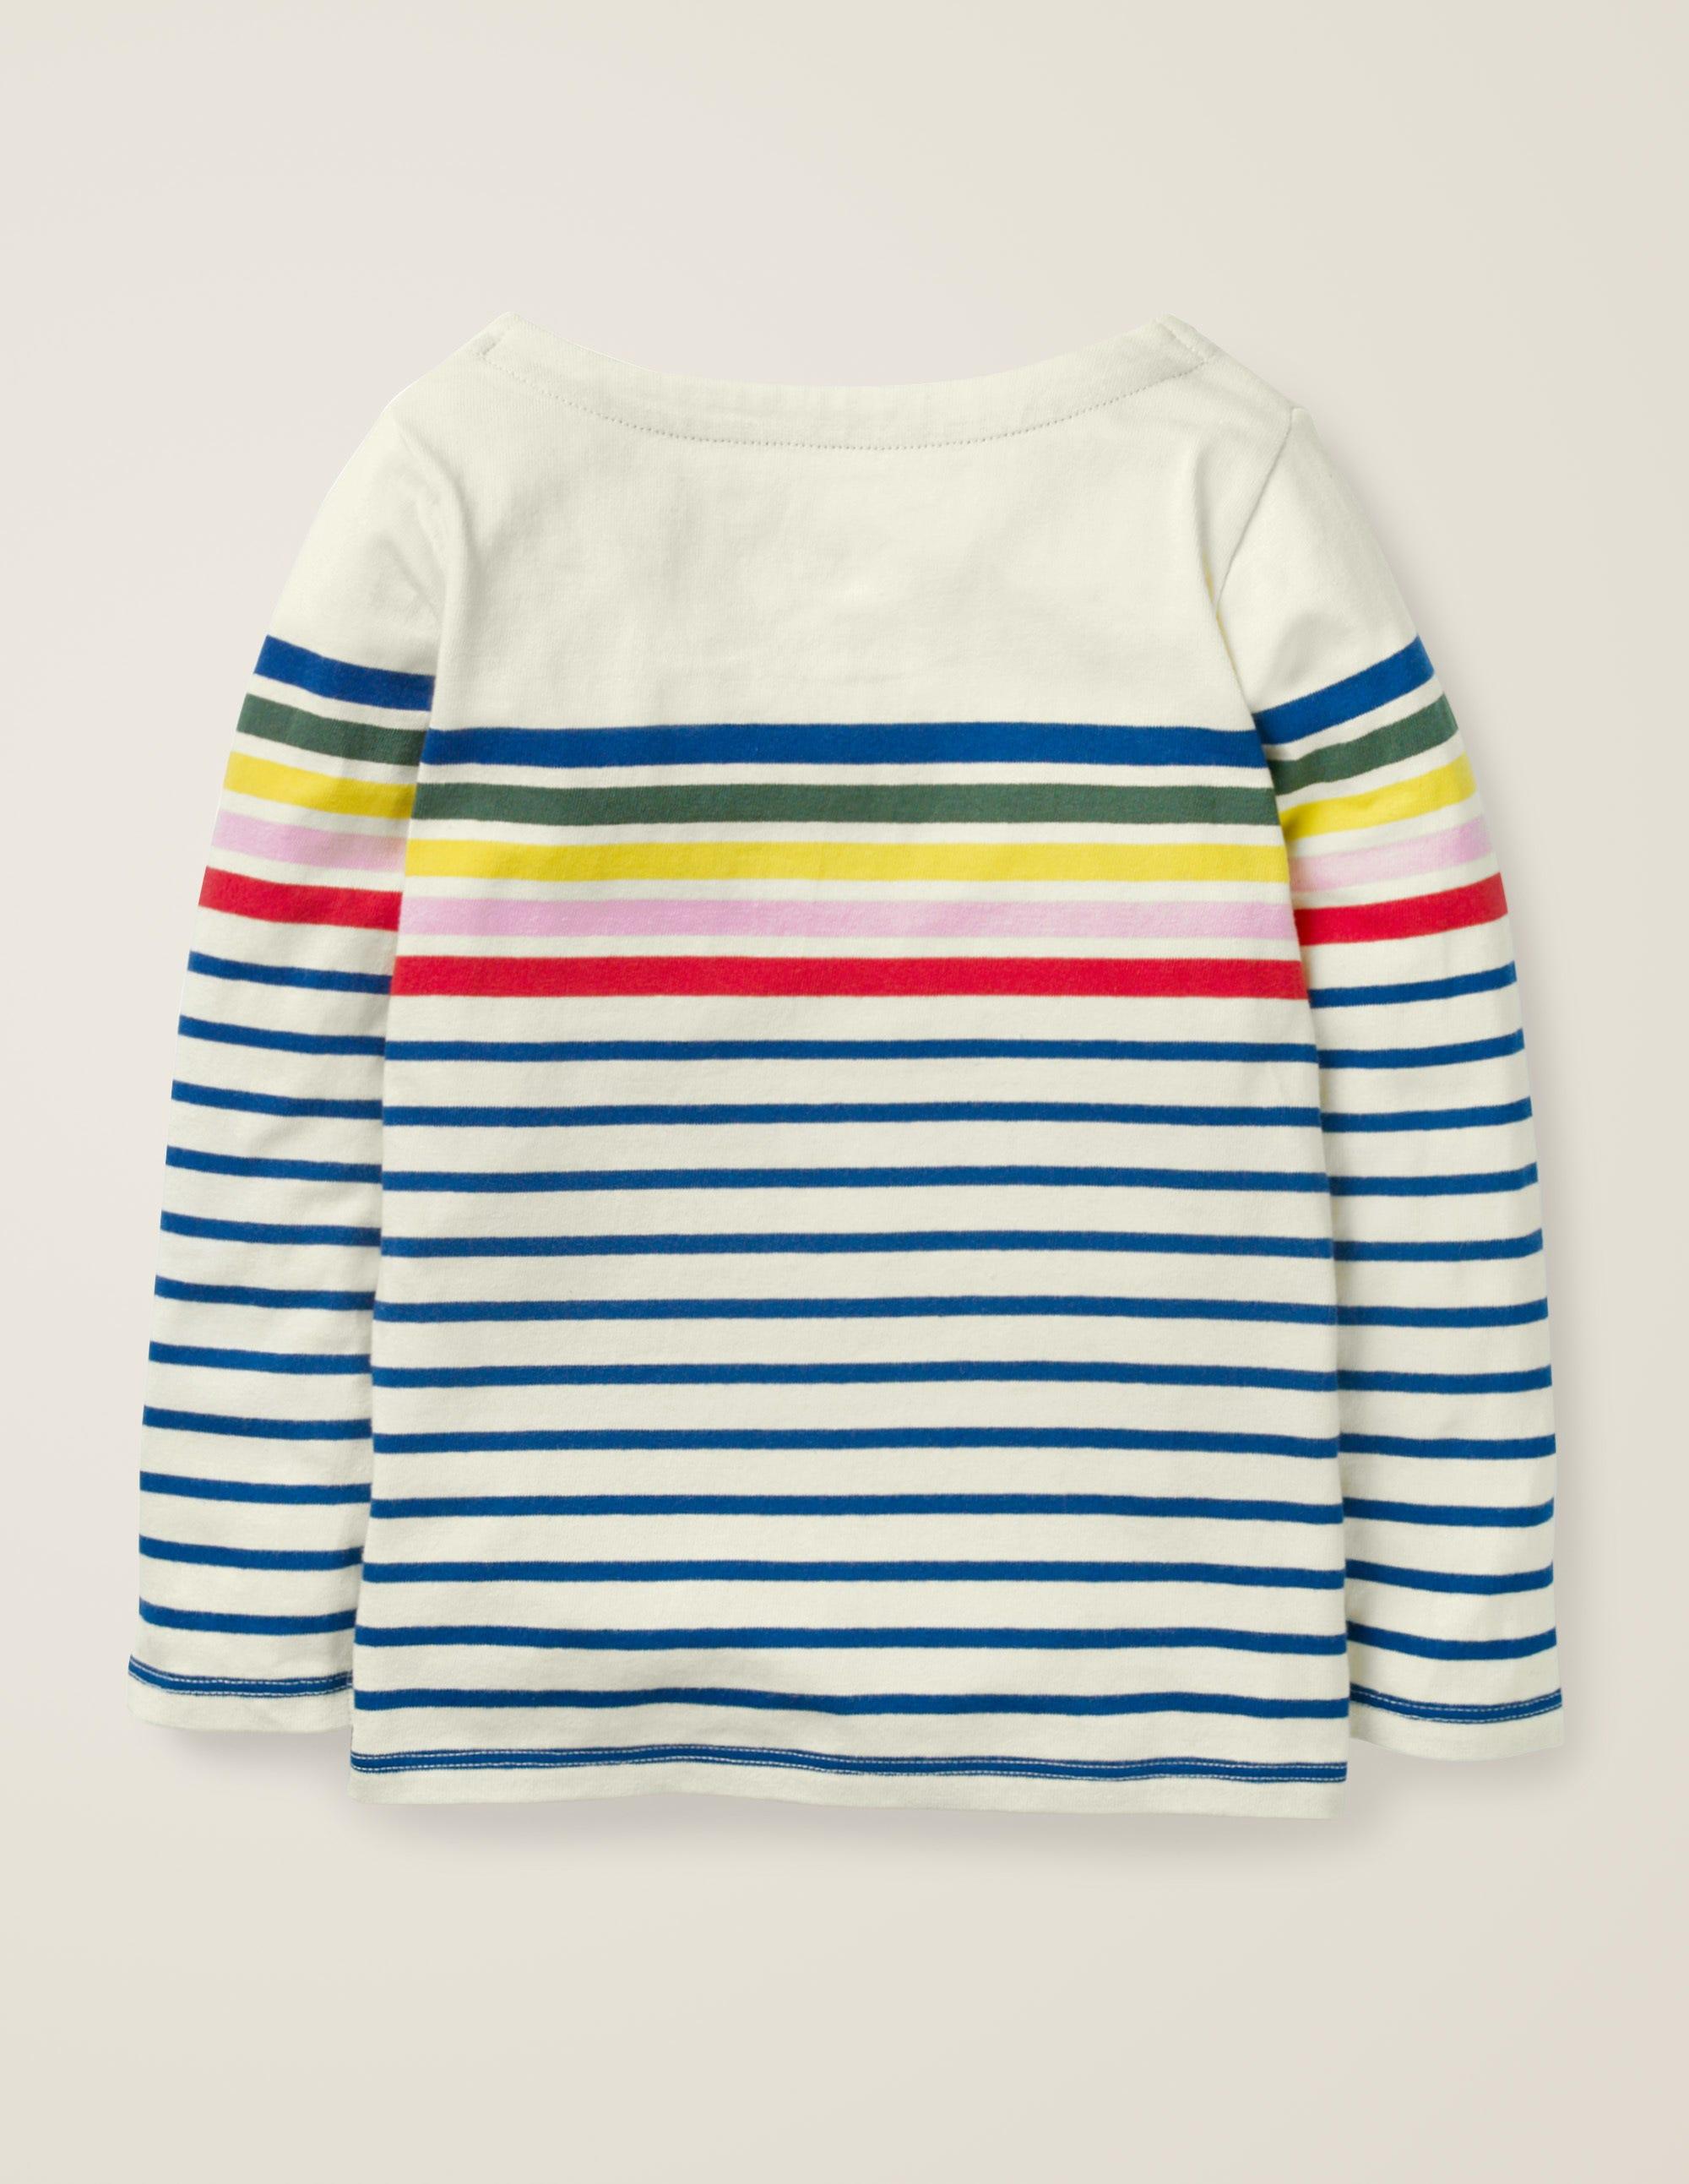 Mini Boden girls applique long sleeve top shirt breton age 2-12 years NEW